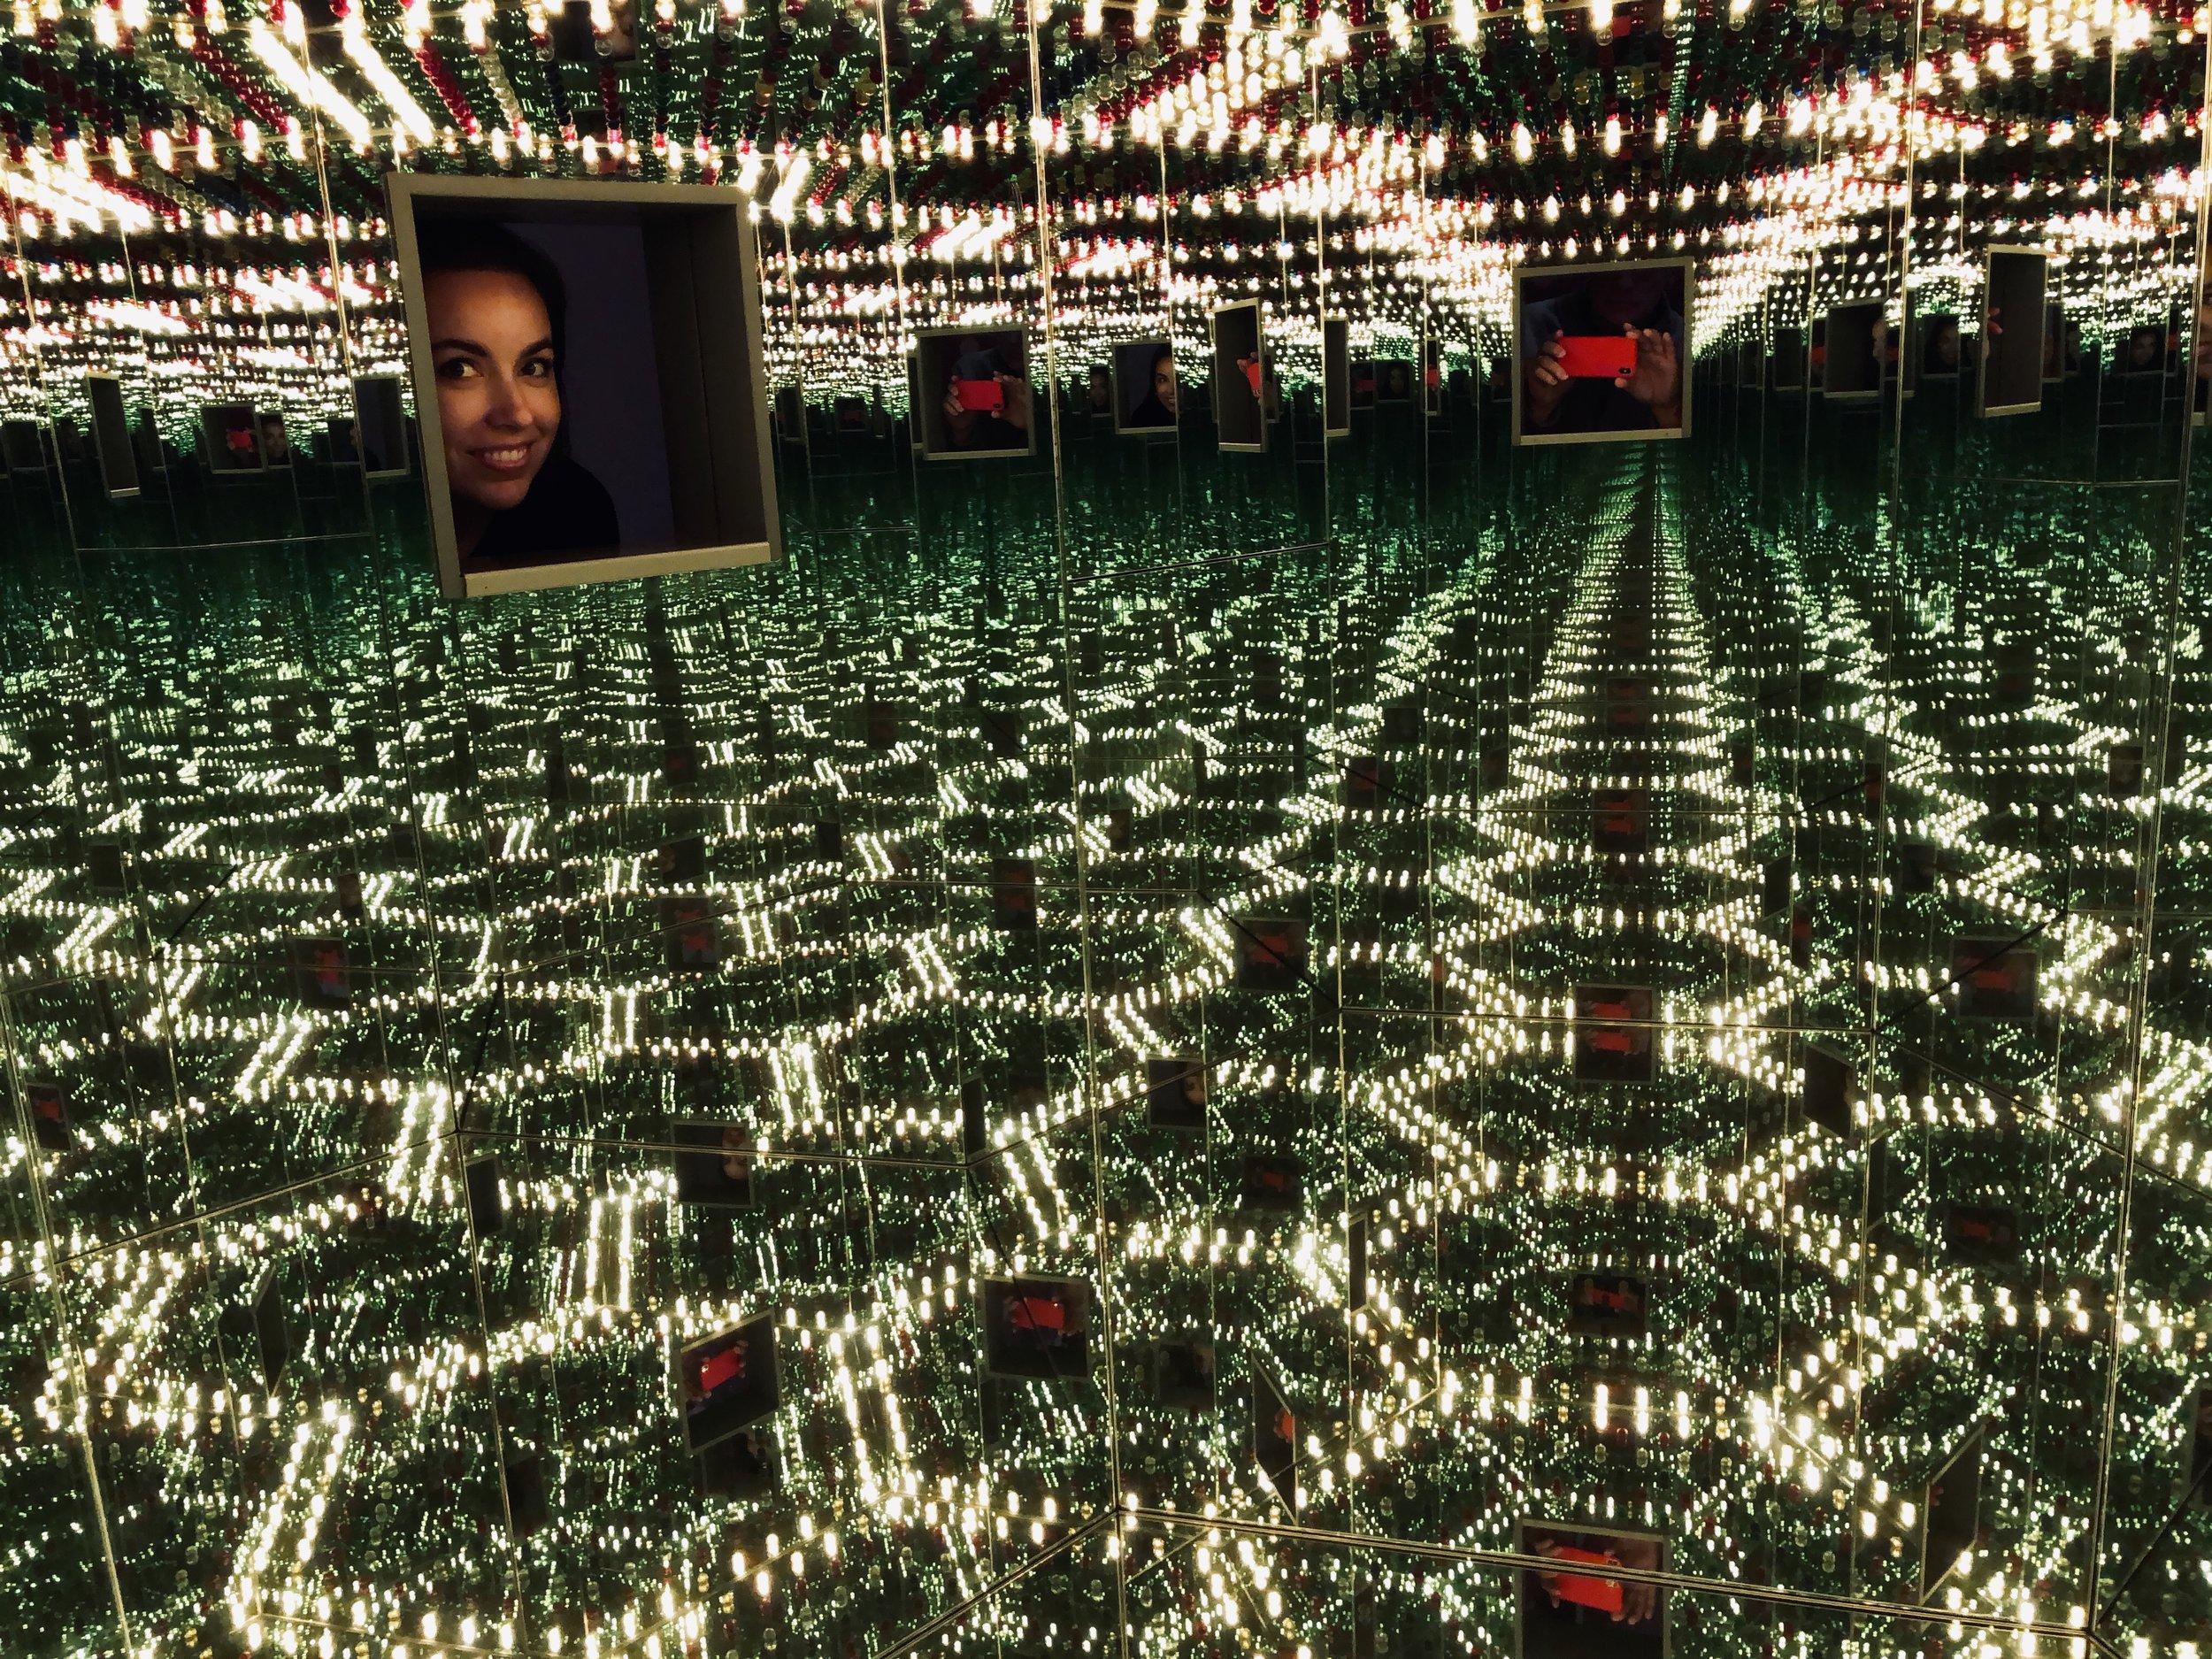 infinity mirrors 5